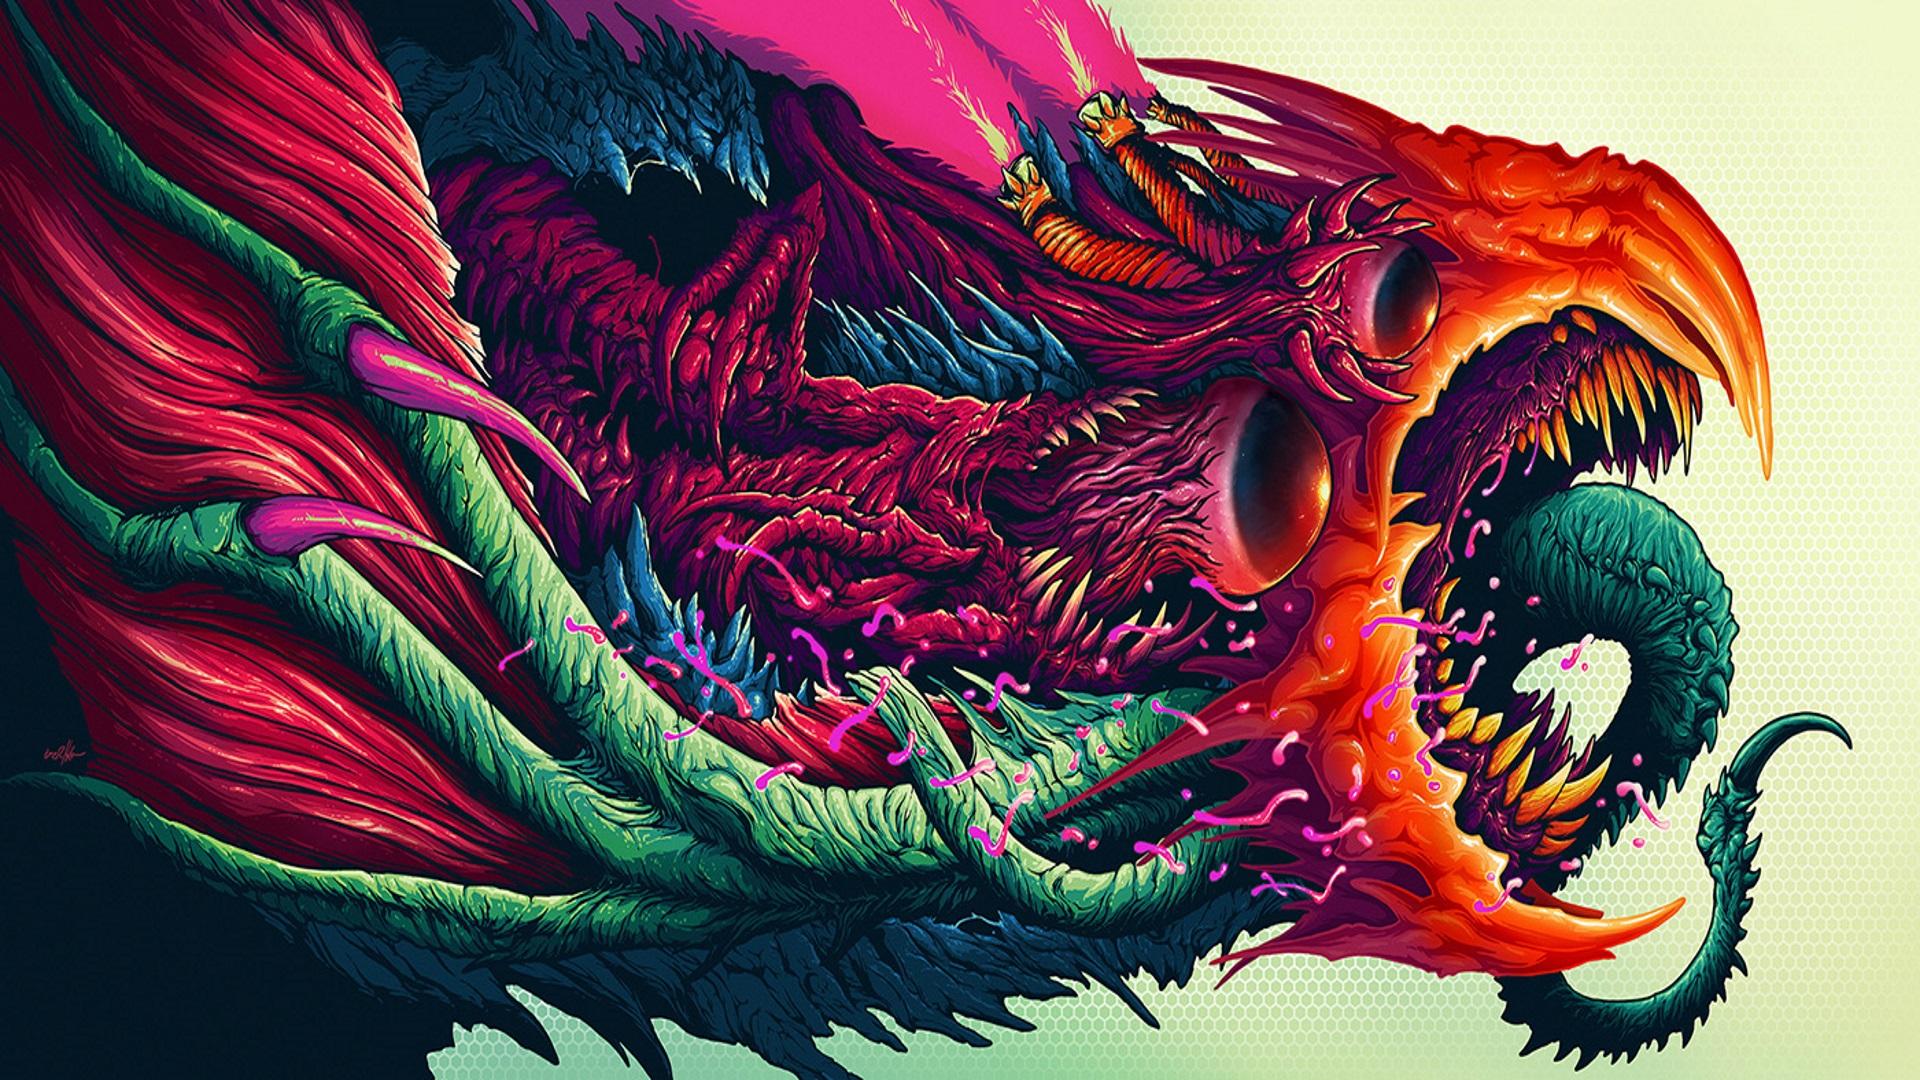 Hyper Beast Wallpaper 1920x1080   Album on Imgur 1920x1080